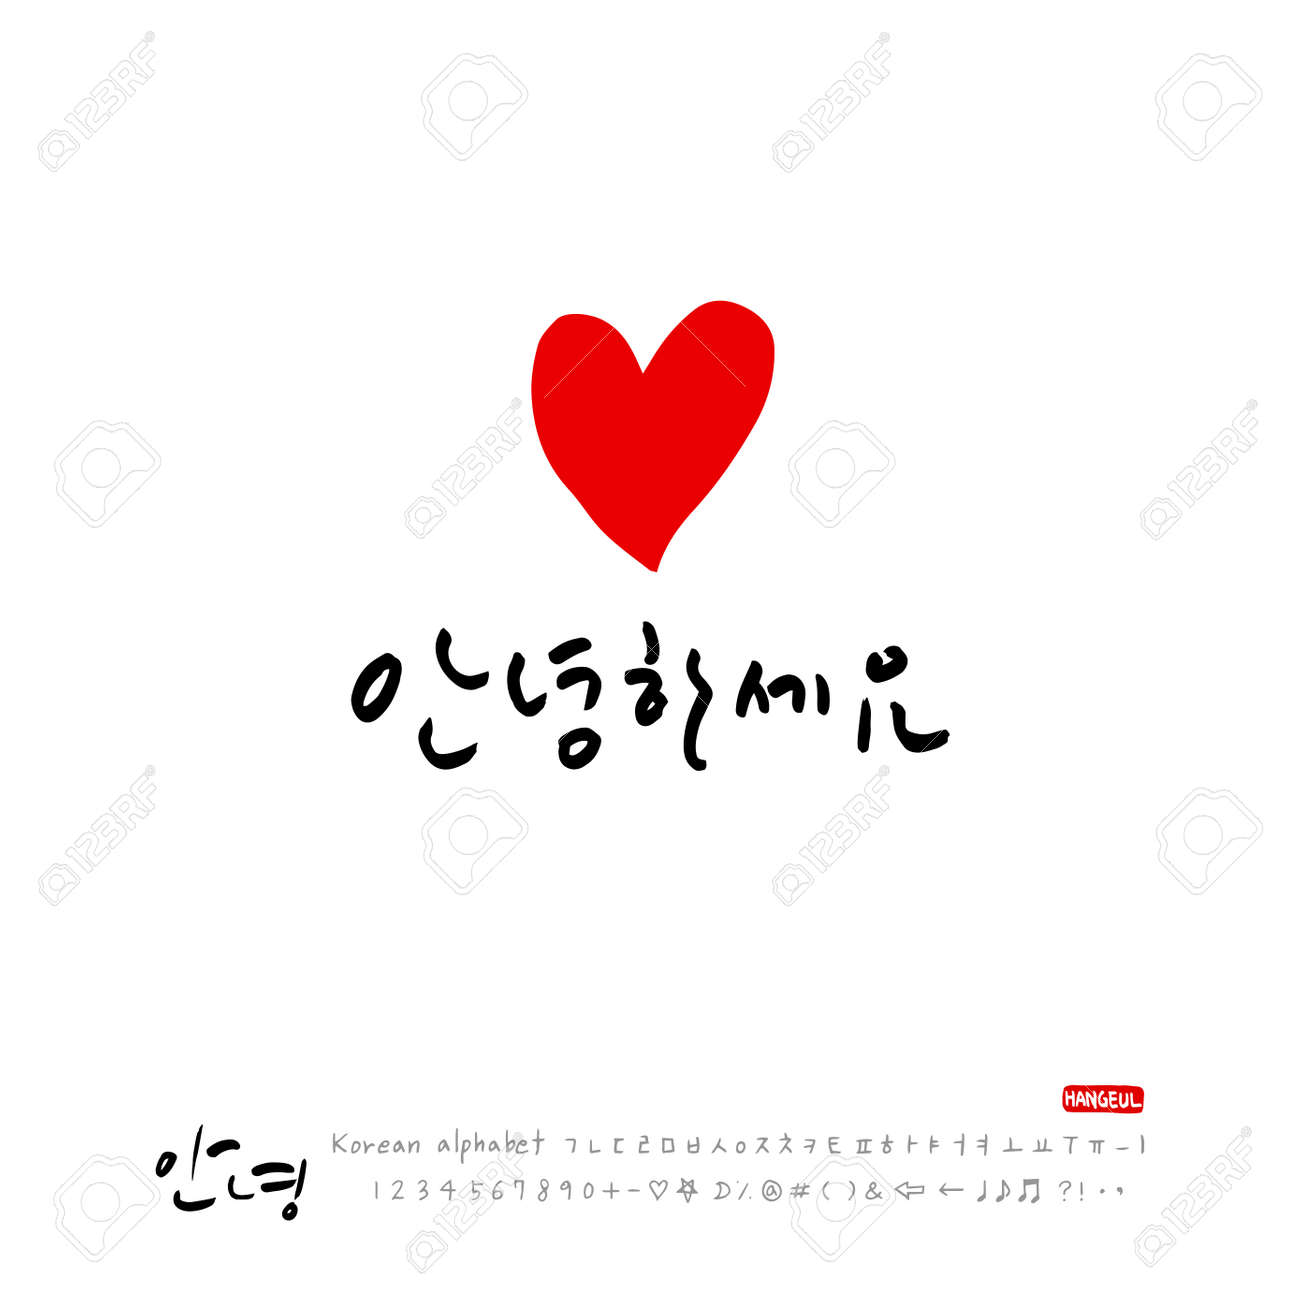 Handwritten calligraphy with heart beautiful korean greeting handwritten calligraphy with heart beautiful korean greeting hello vector illustration stock vector m4hsunfo